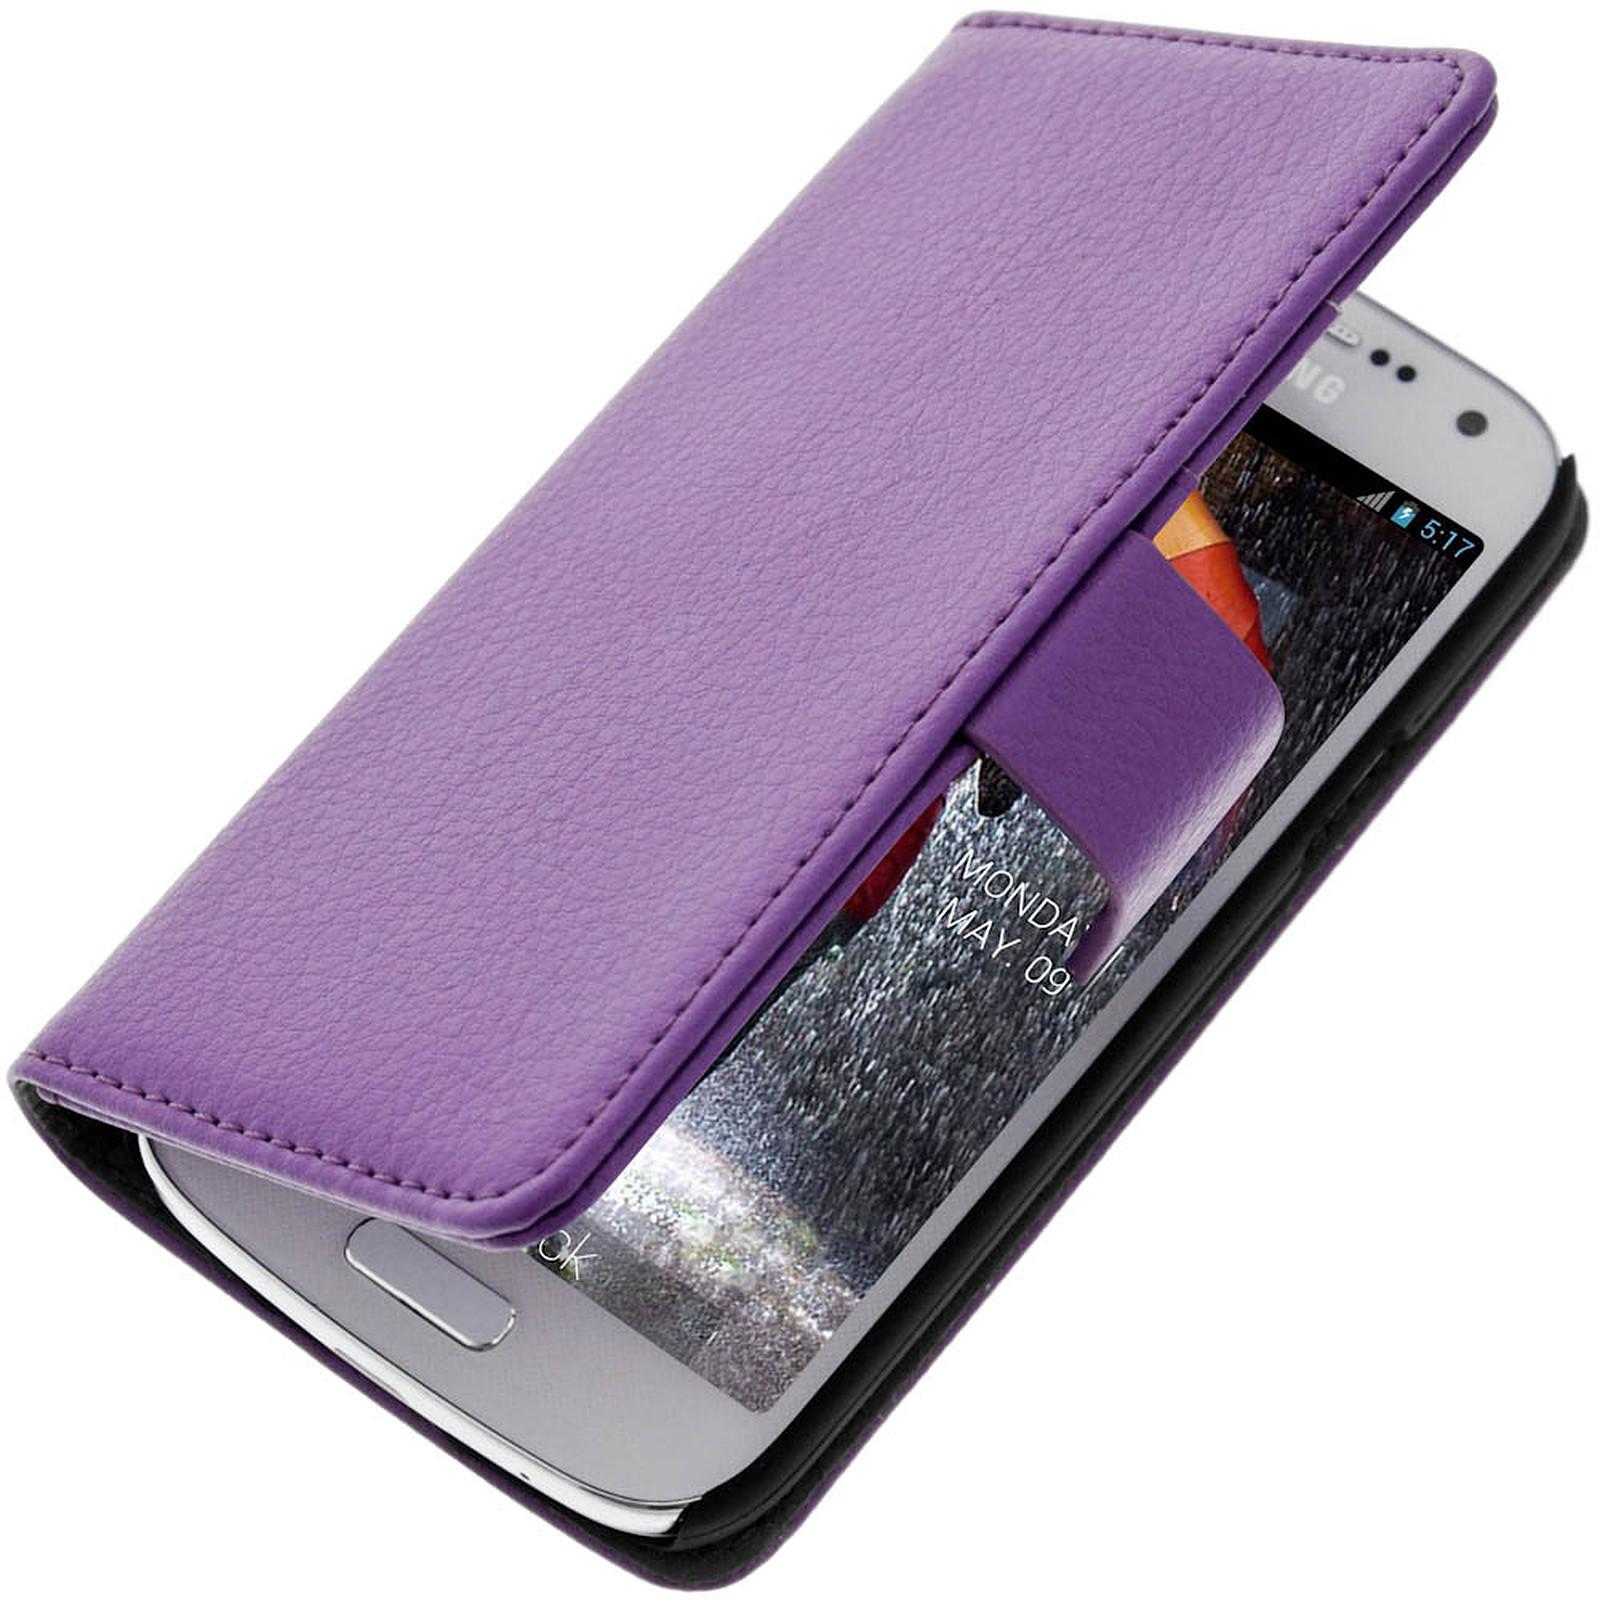 Avizar Etui folio Violet pour Samsung Galaxy S4 Mini